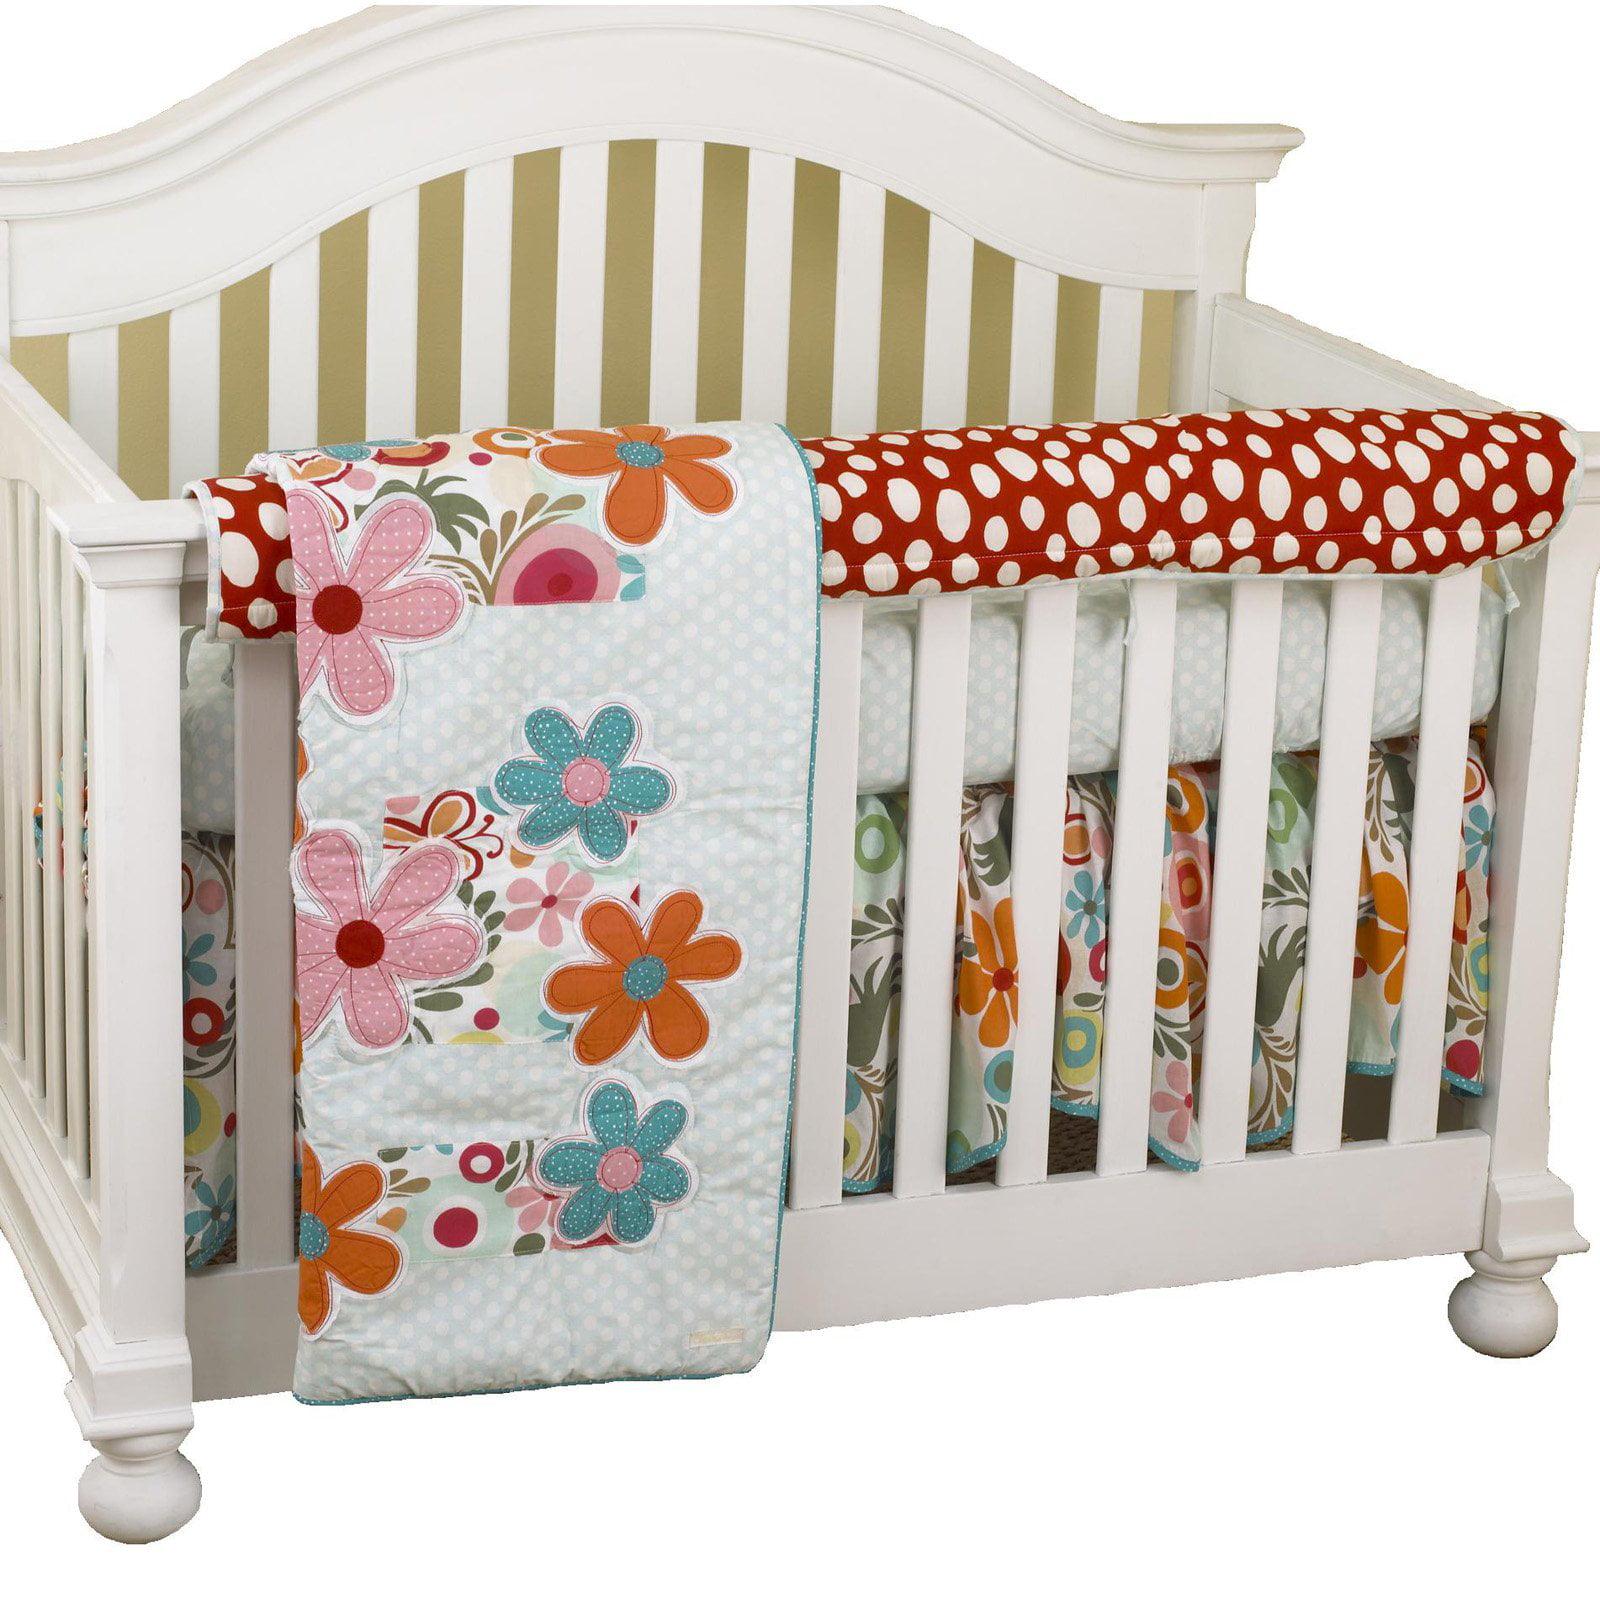 Cotton Tale Designs Lizzie Front Crib Rail Cover Up Set